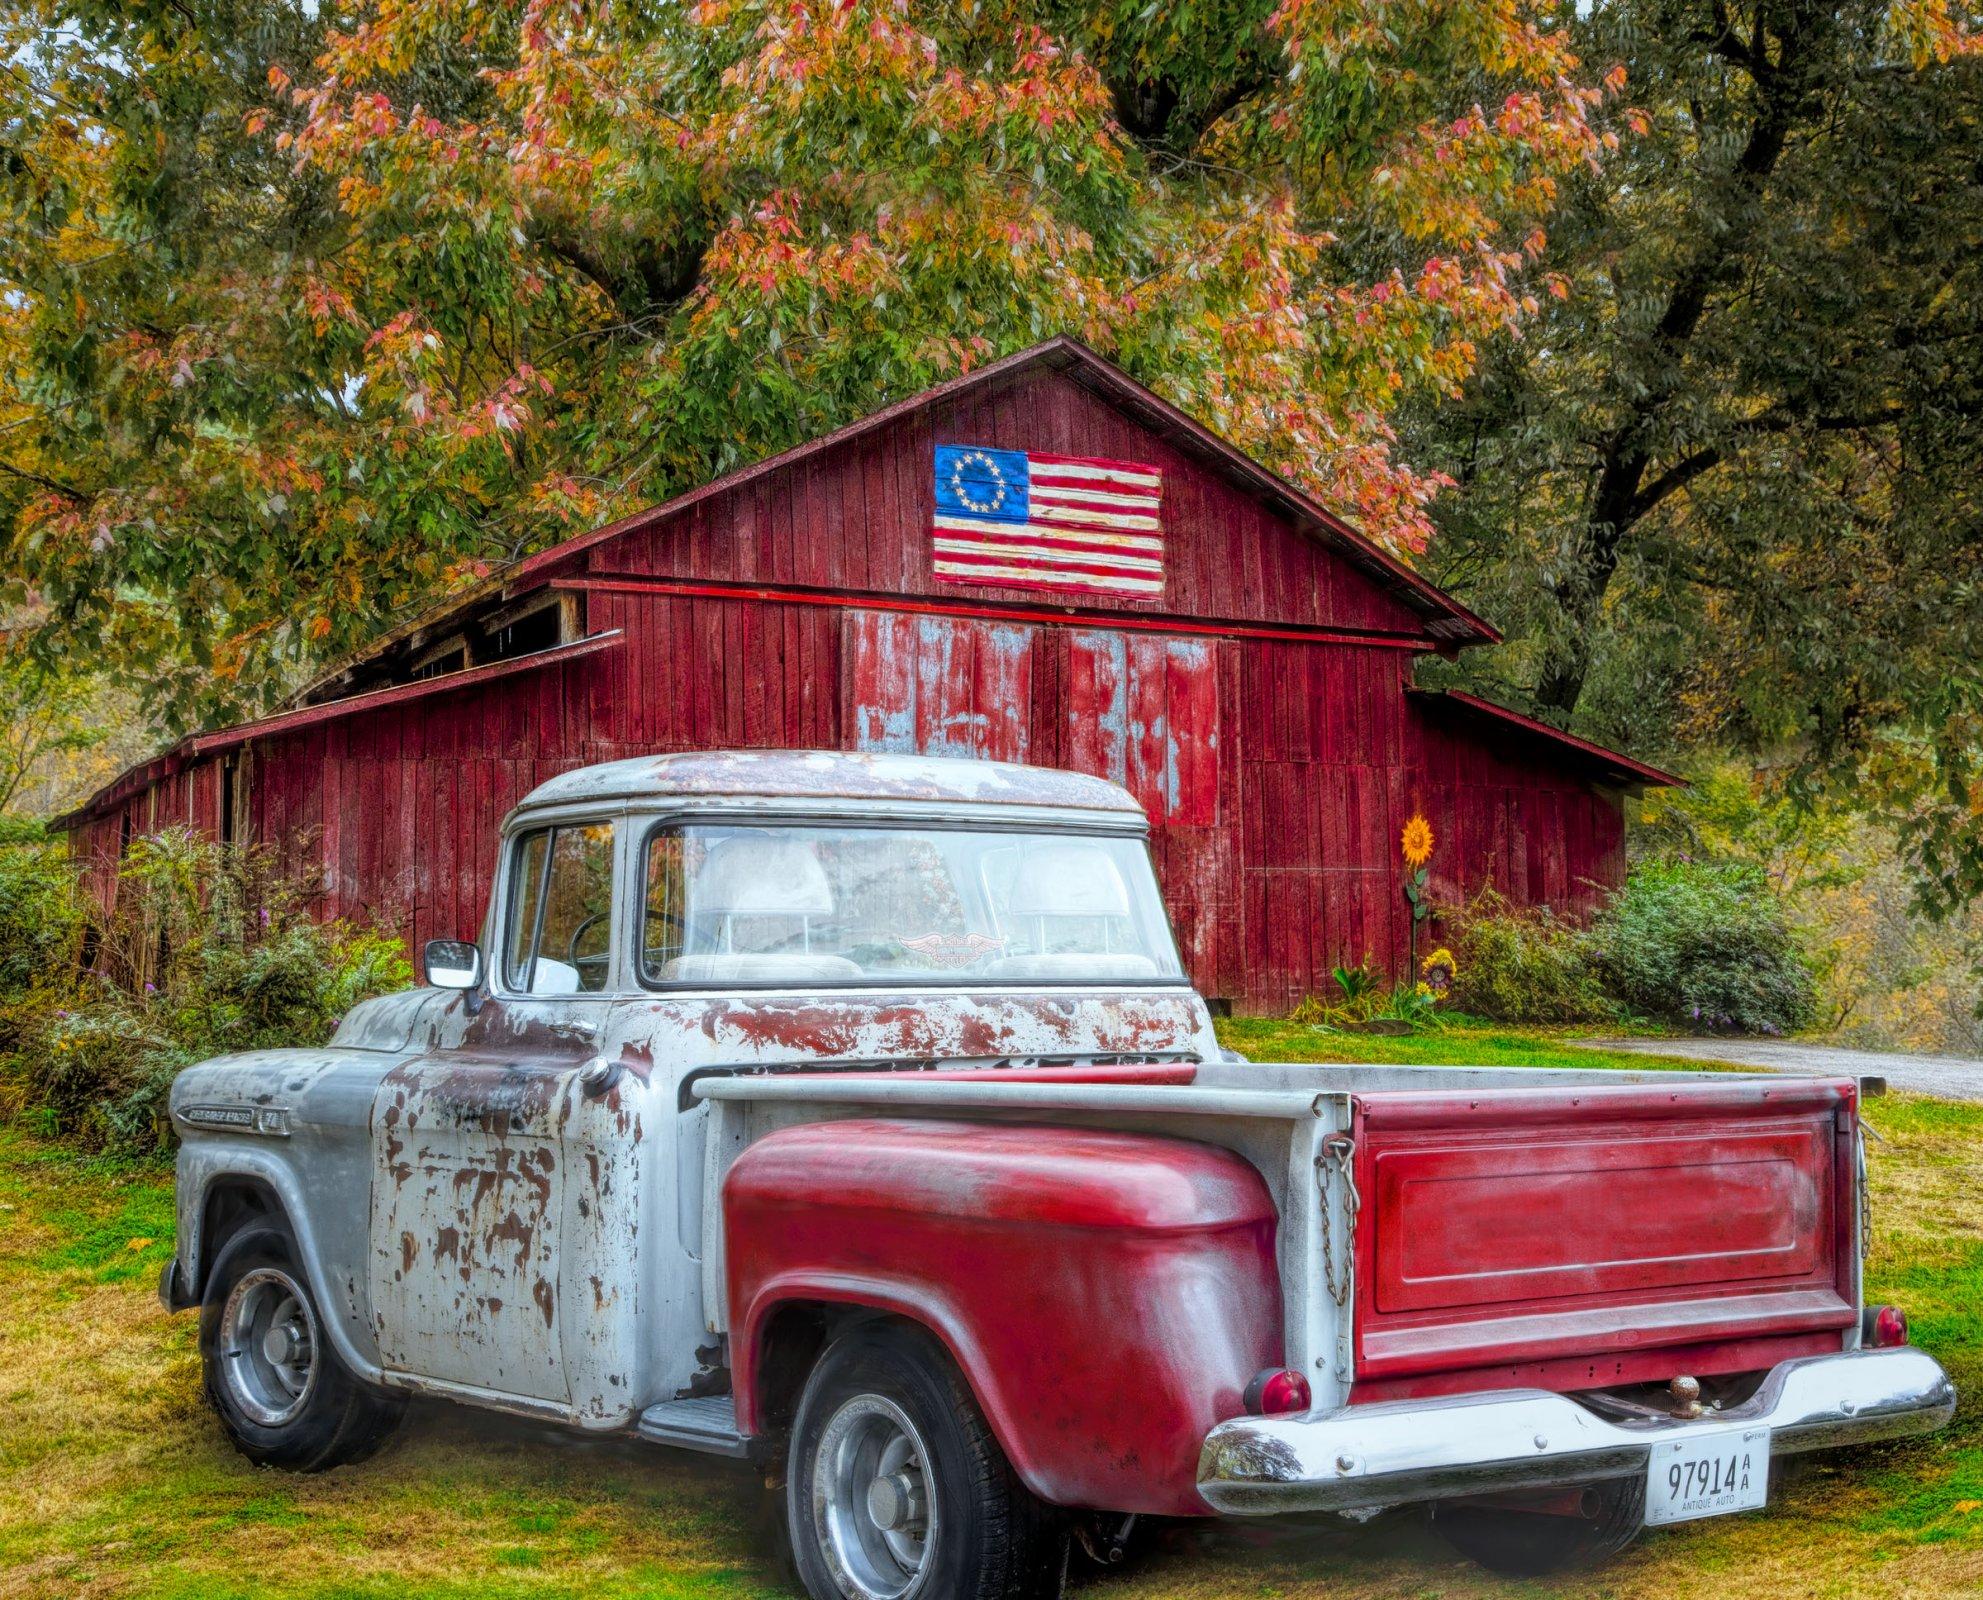 DT-Patriotic Exclusive AL-3779-CW1 Southern Vintage 35.5 x 44 Digitally Printed ...